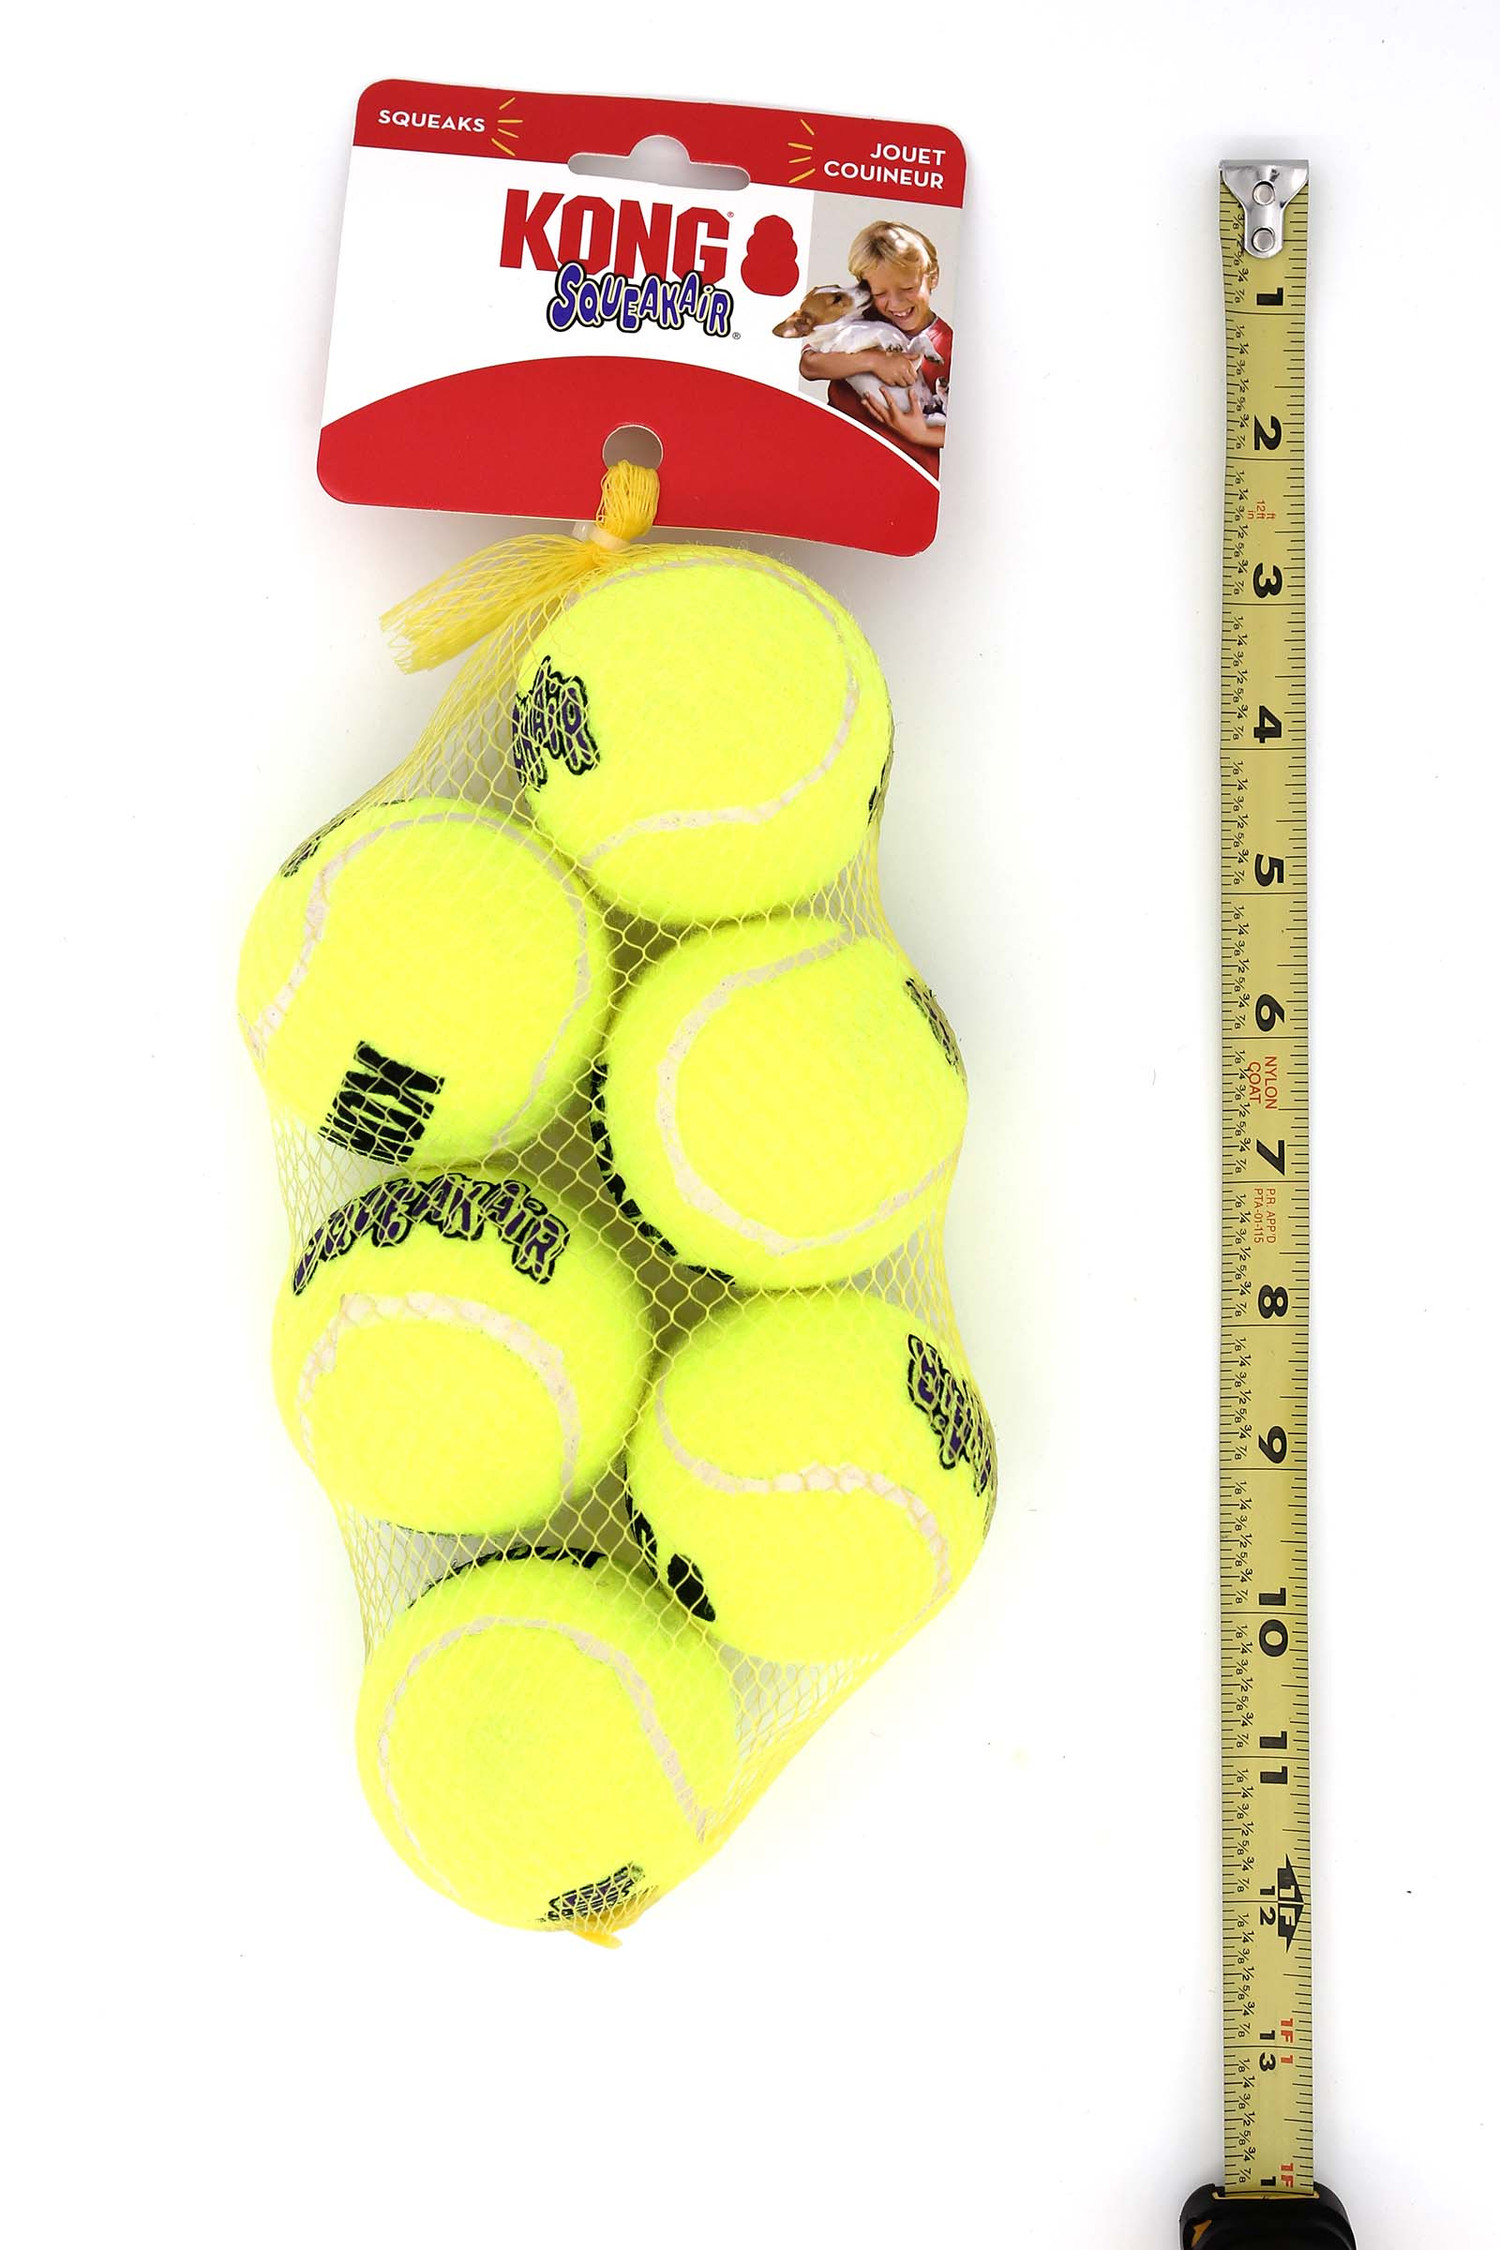 KONG Squeak Air Tennis Ball Dog Toys - 6 Pack - Medium